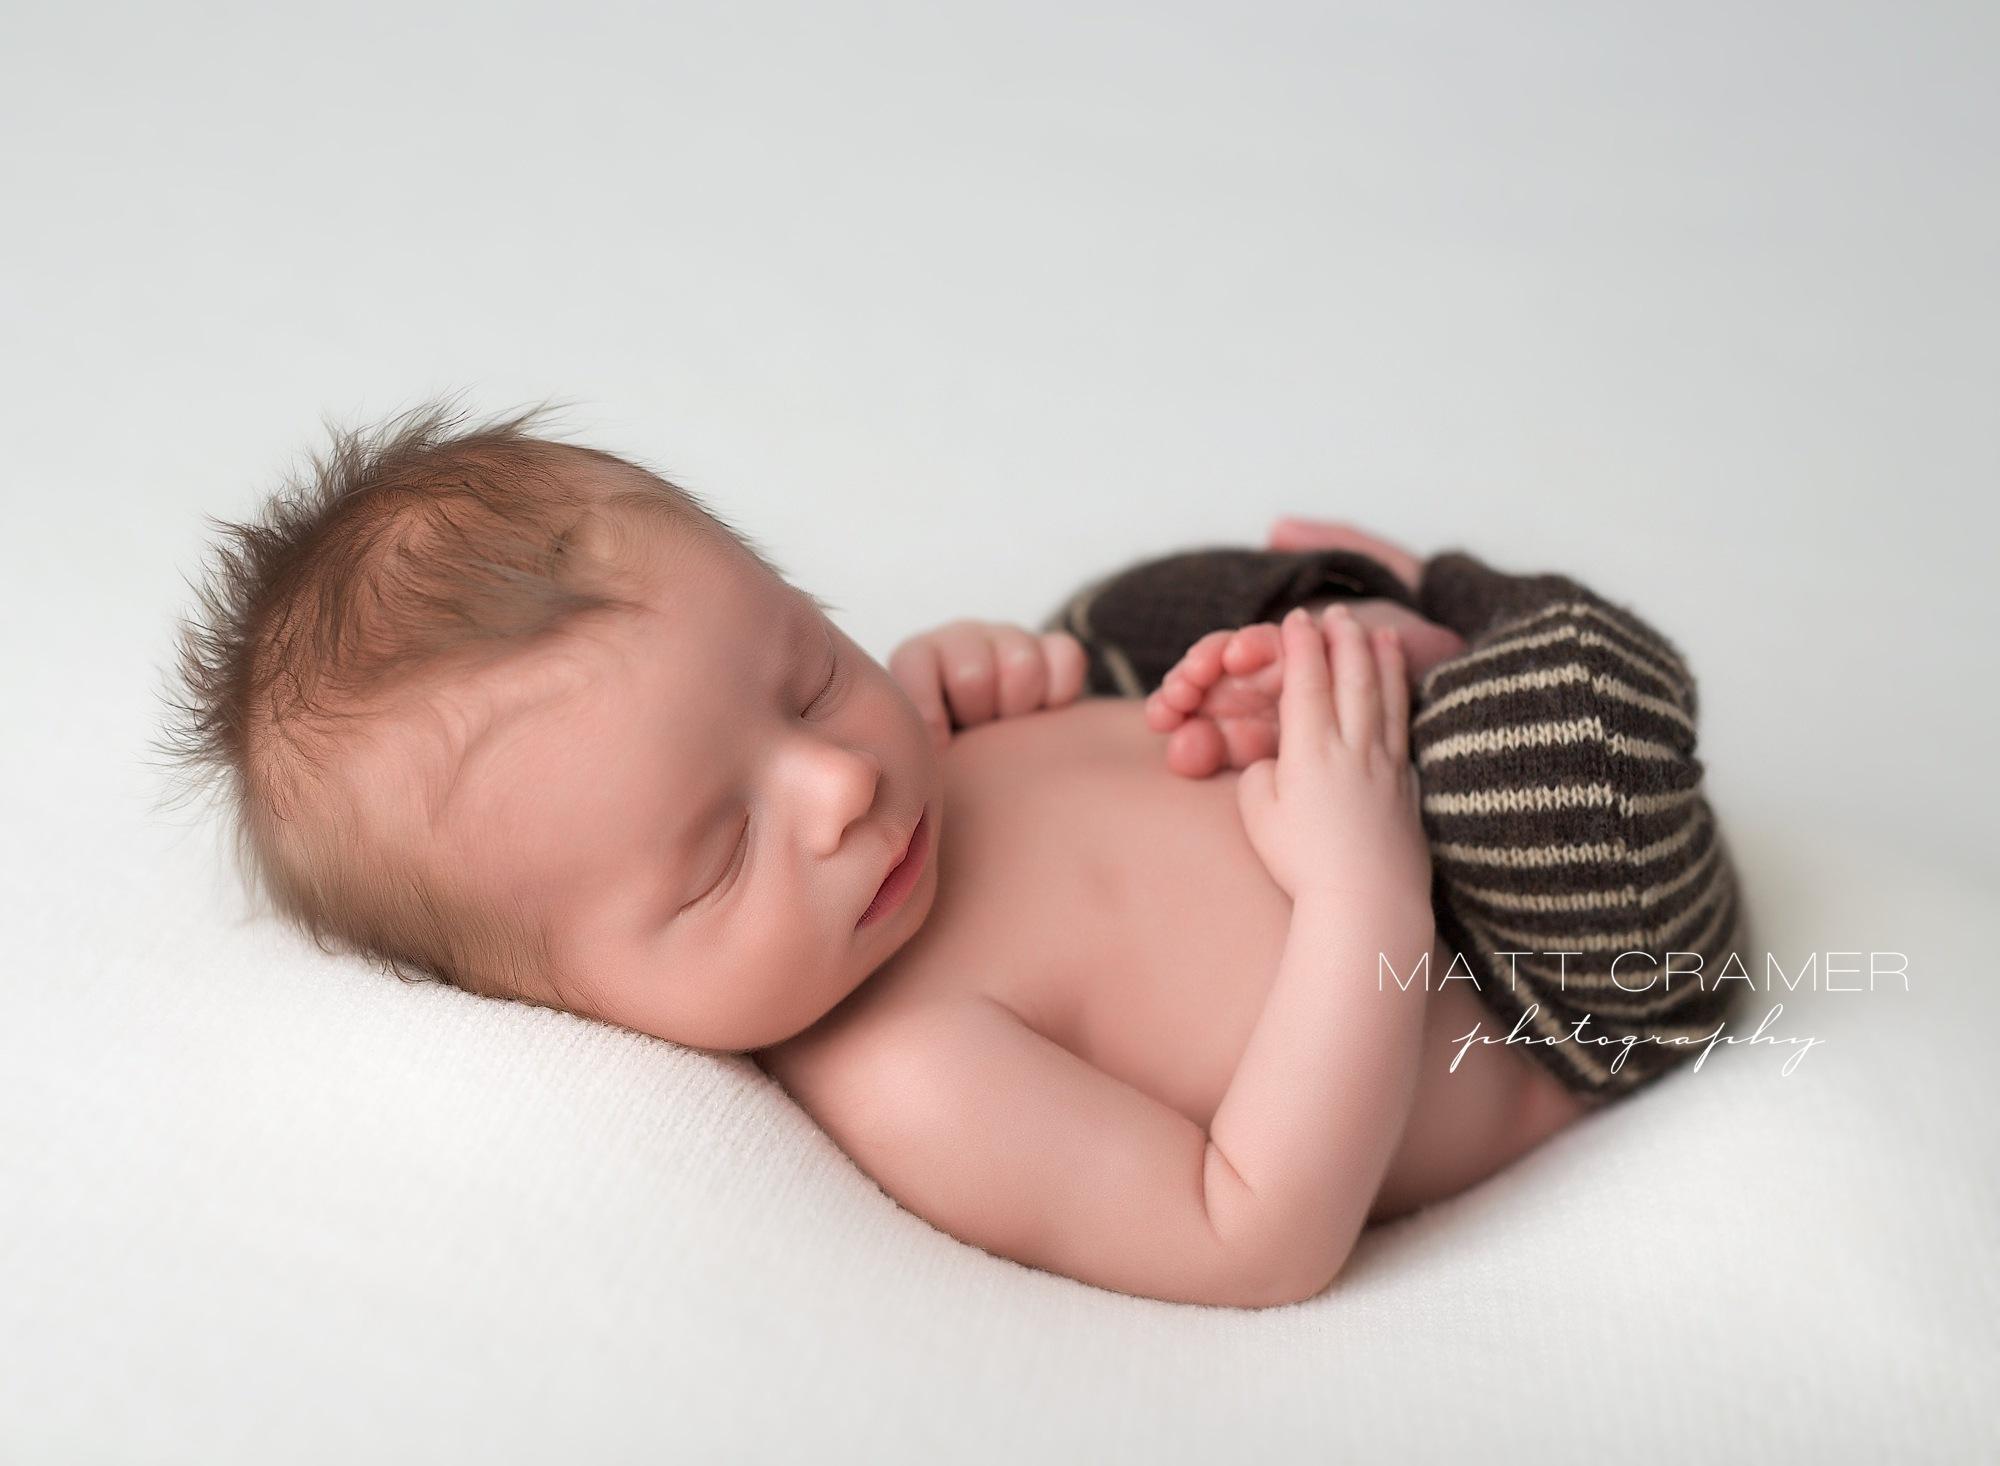 Sleeping newborn in sleep pants by Los Angeles Newborn Photography | Matt Cramer Photography